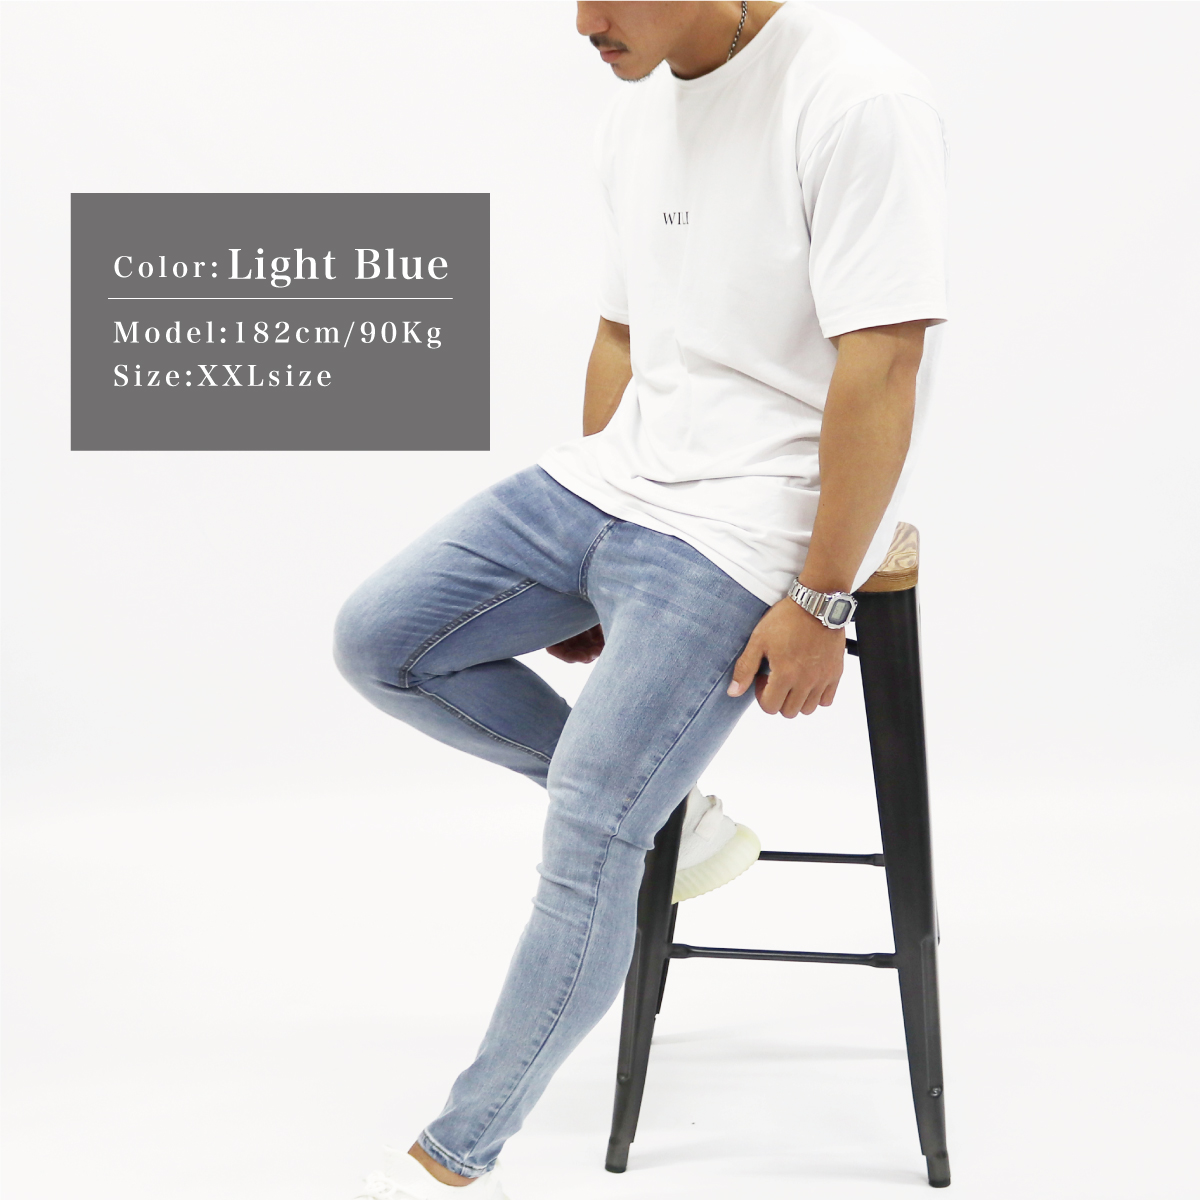 SUPER STRETCH SKINNY JEANS - LIGHT BLUE